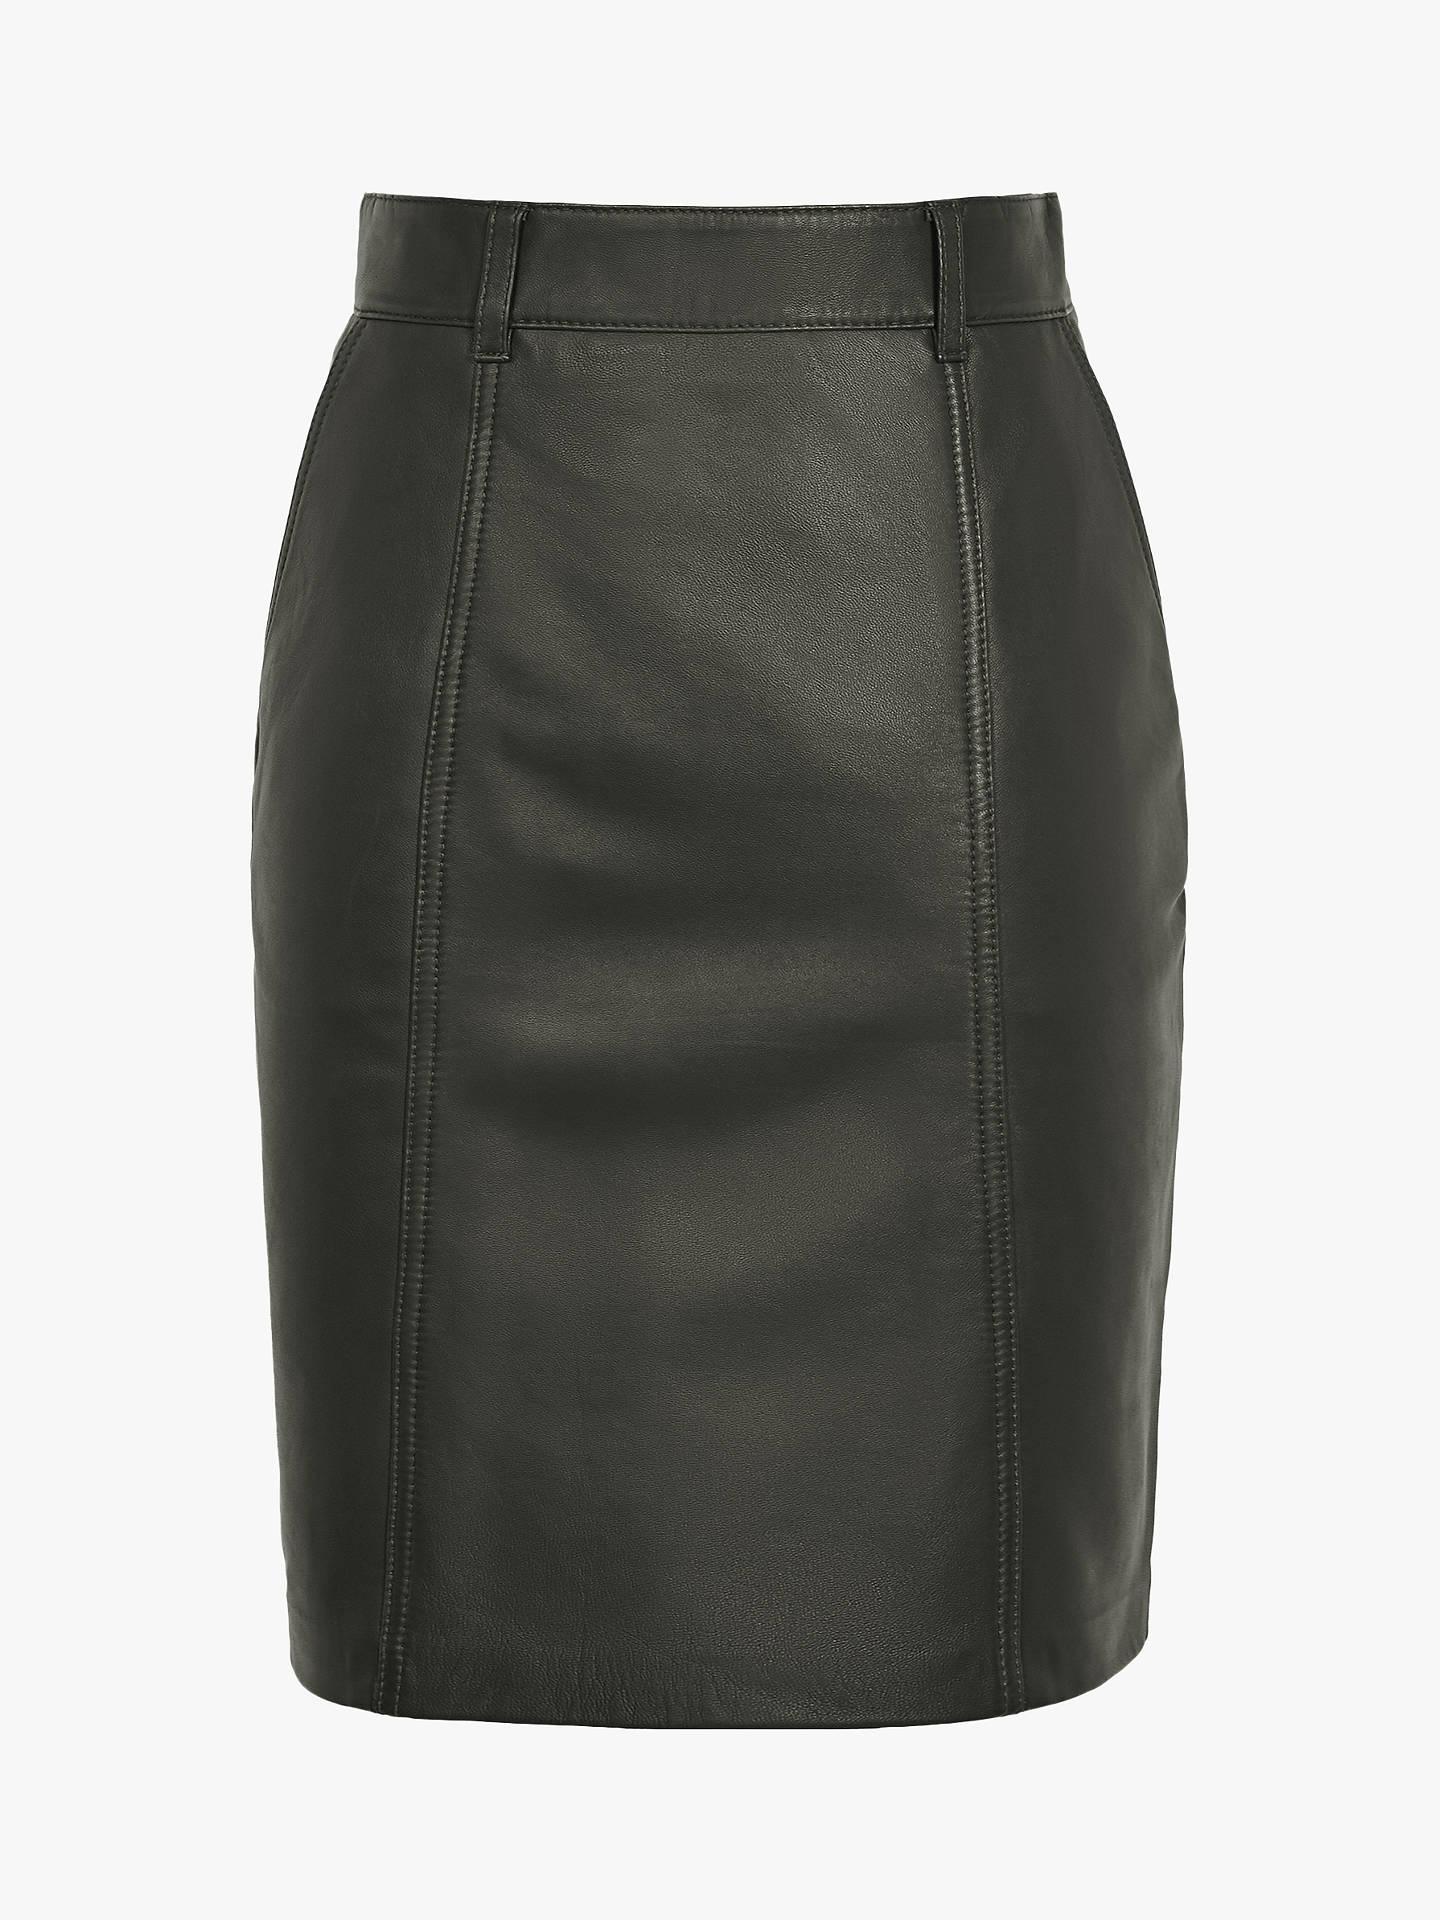 8c0557ebee6947 ... Buy Reiss Kara Leather Pencil Skirt, Army Green, 6 Online at  johnlewis.com ...